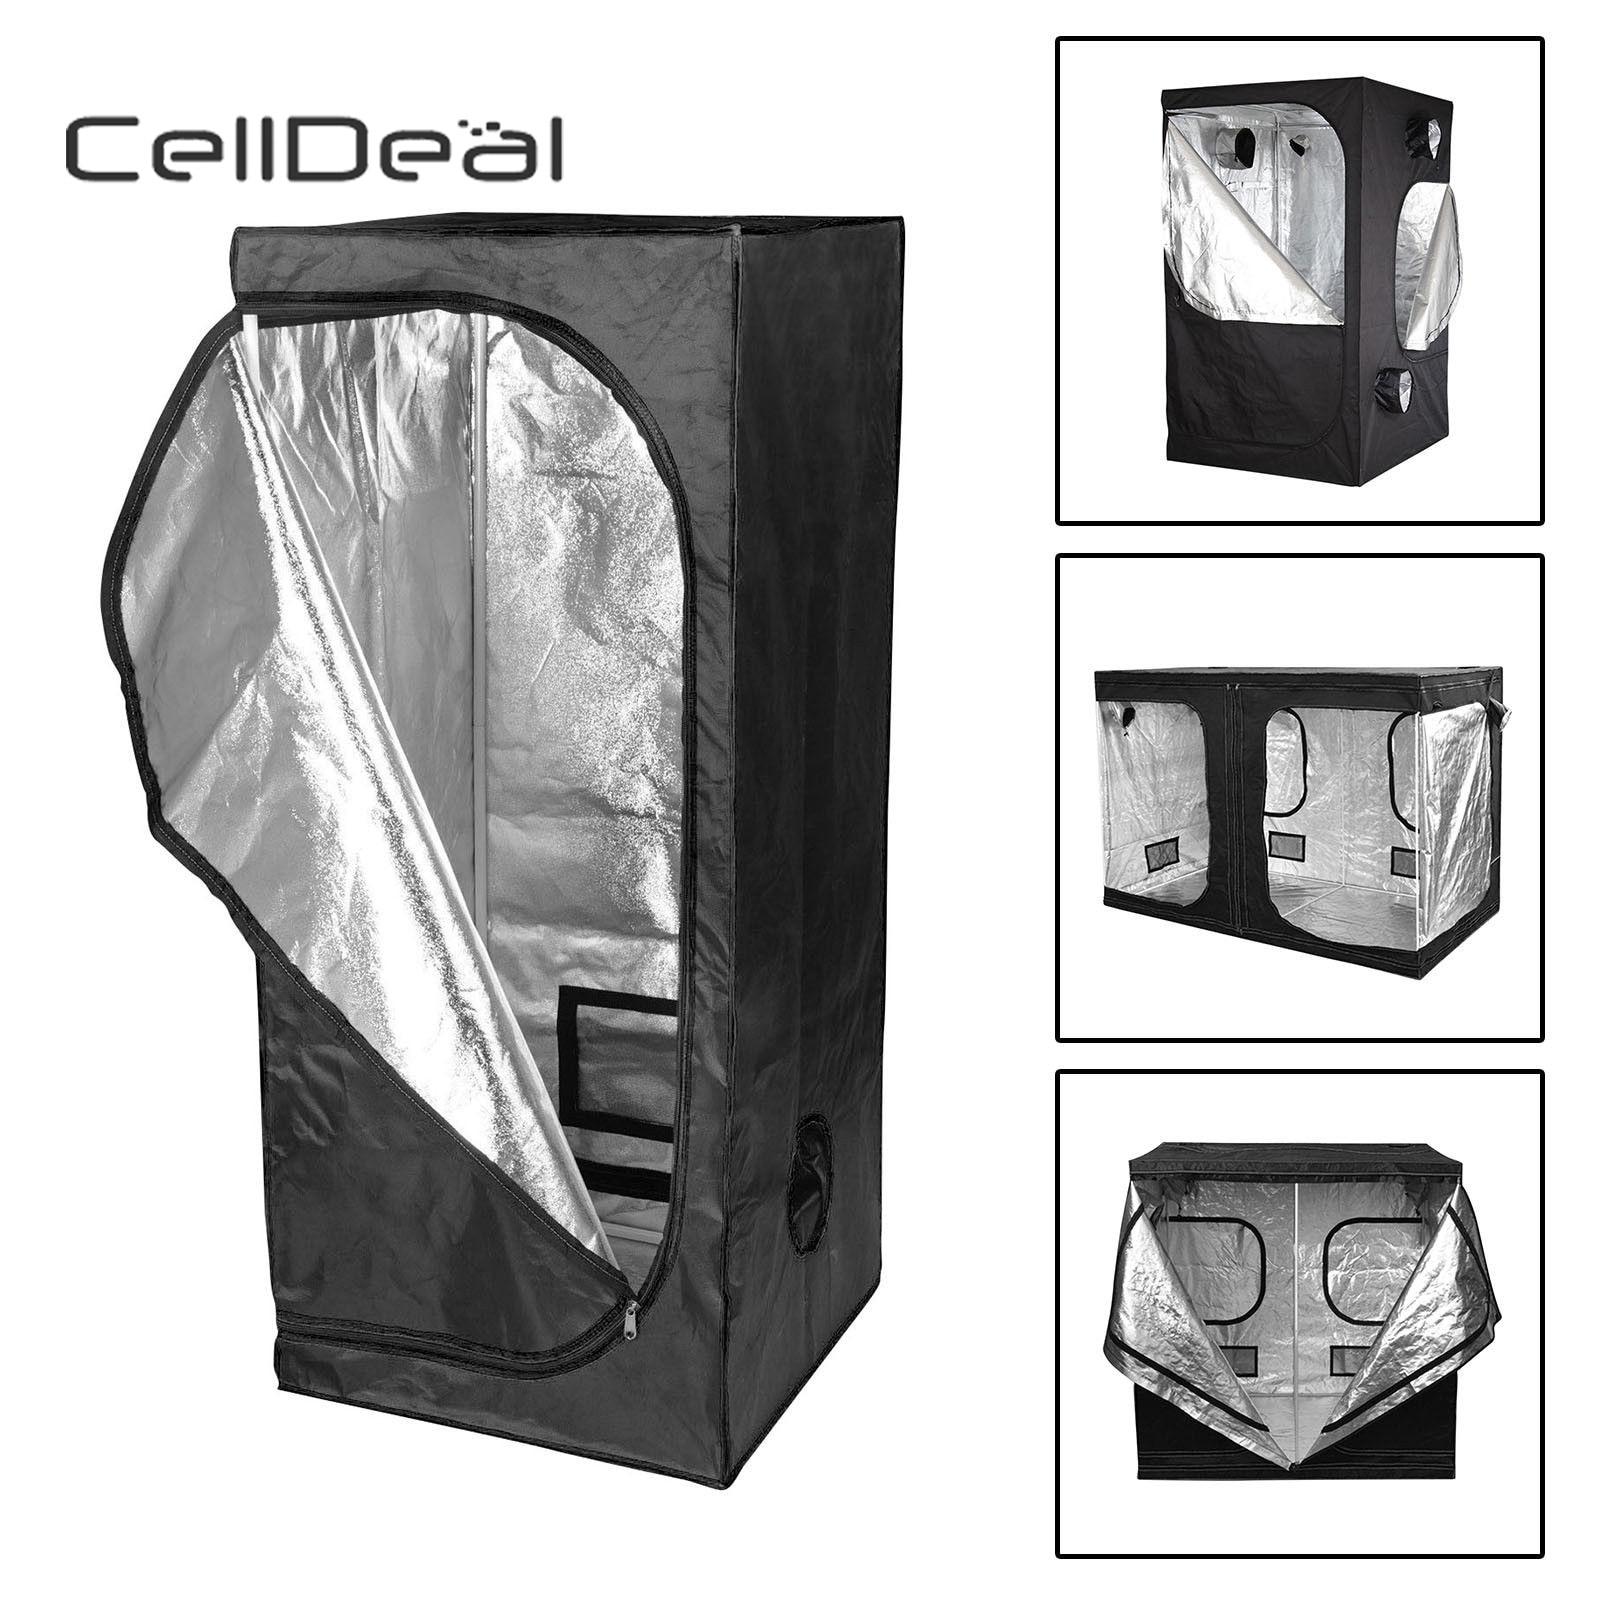 CellDeal Premium cultiver tente argent Mylar intérieur bourgeon boîte hydroponique chambre sombre tailles cultiver tente Oxford tissu cultiver tente hydroponique